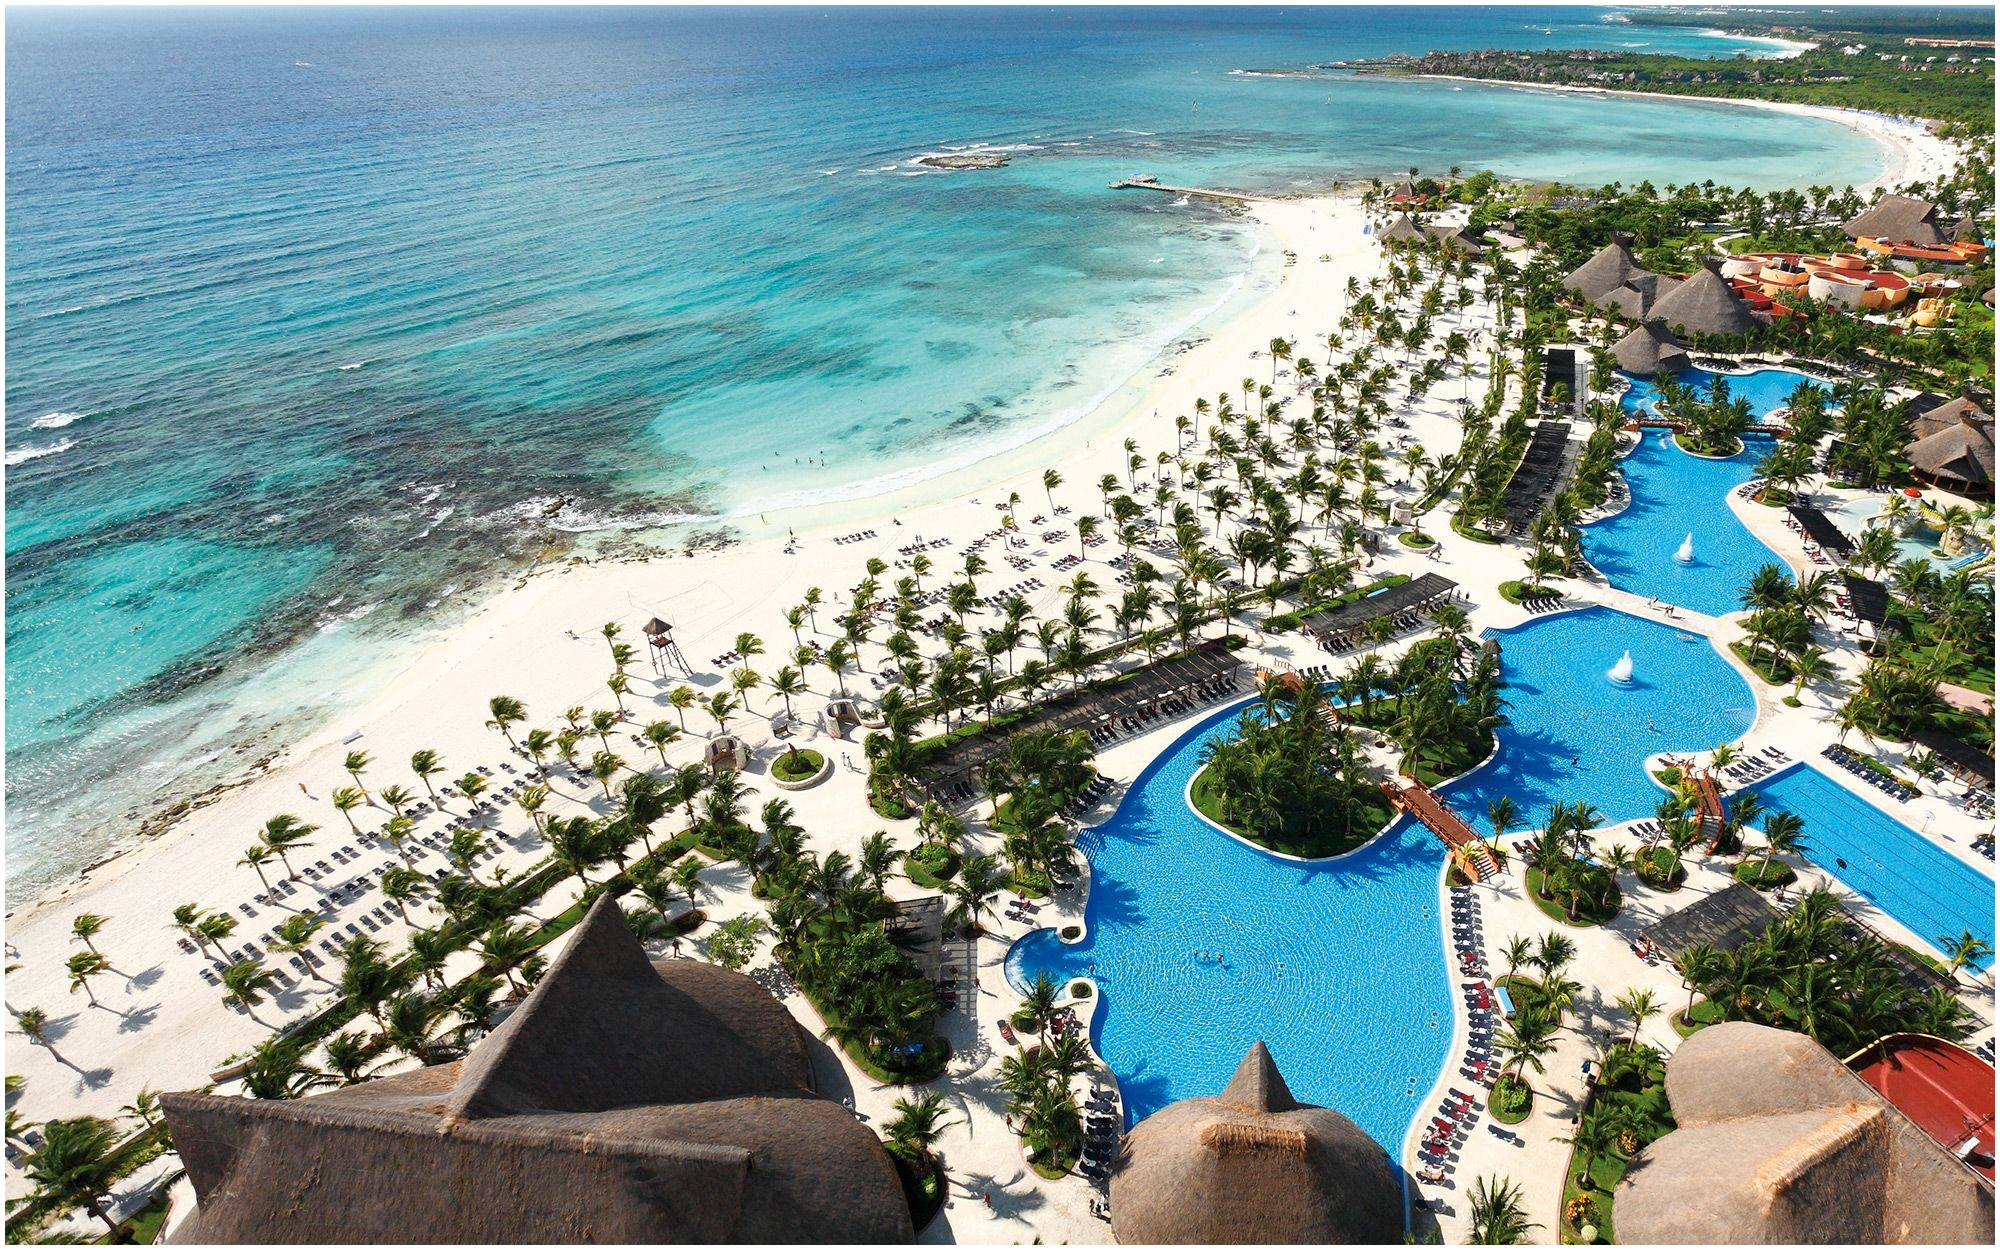 Italian Beach Holidays All Inclusive Luxury All Inclusive Resorts Barcel³ Maya Beach Resort Riviera Maya